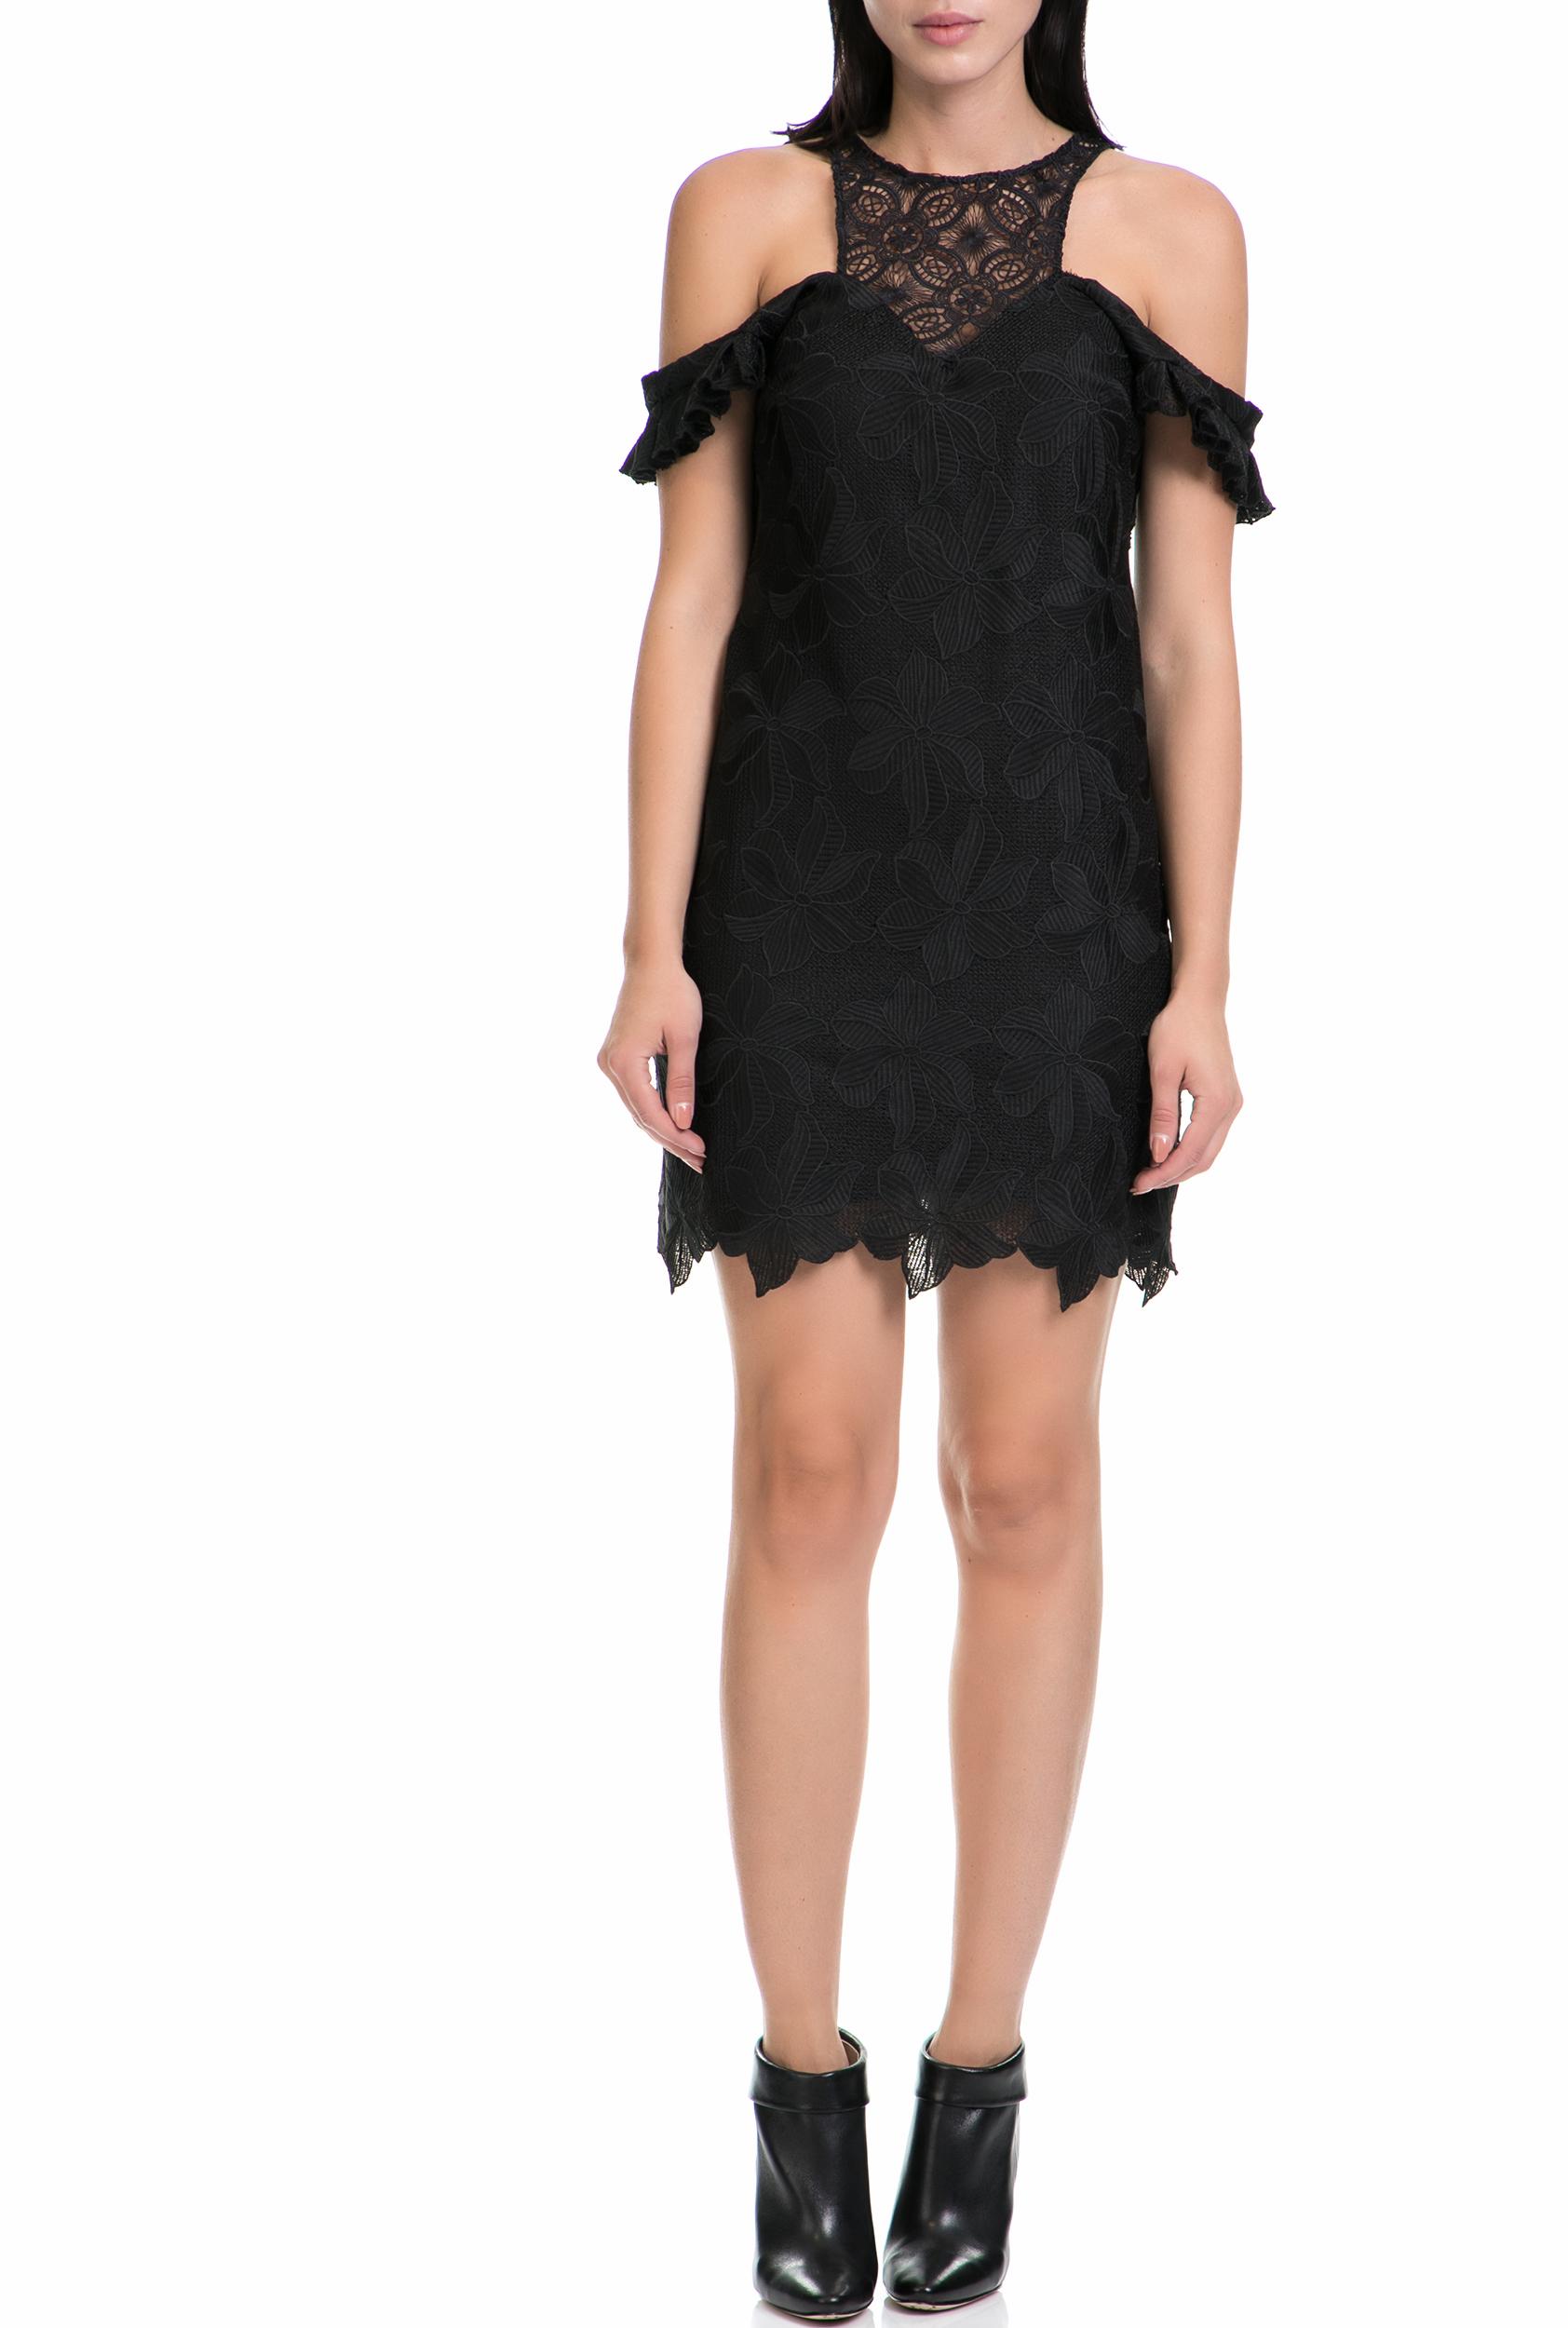 9e5533d21448 GUESS - Γυναικεία Κοντά Φορέματα | Outfit.gr